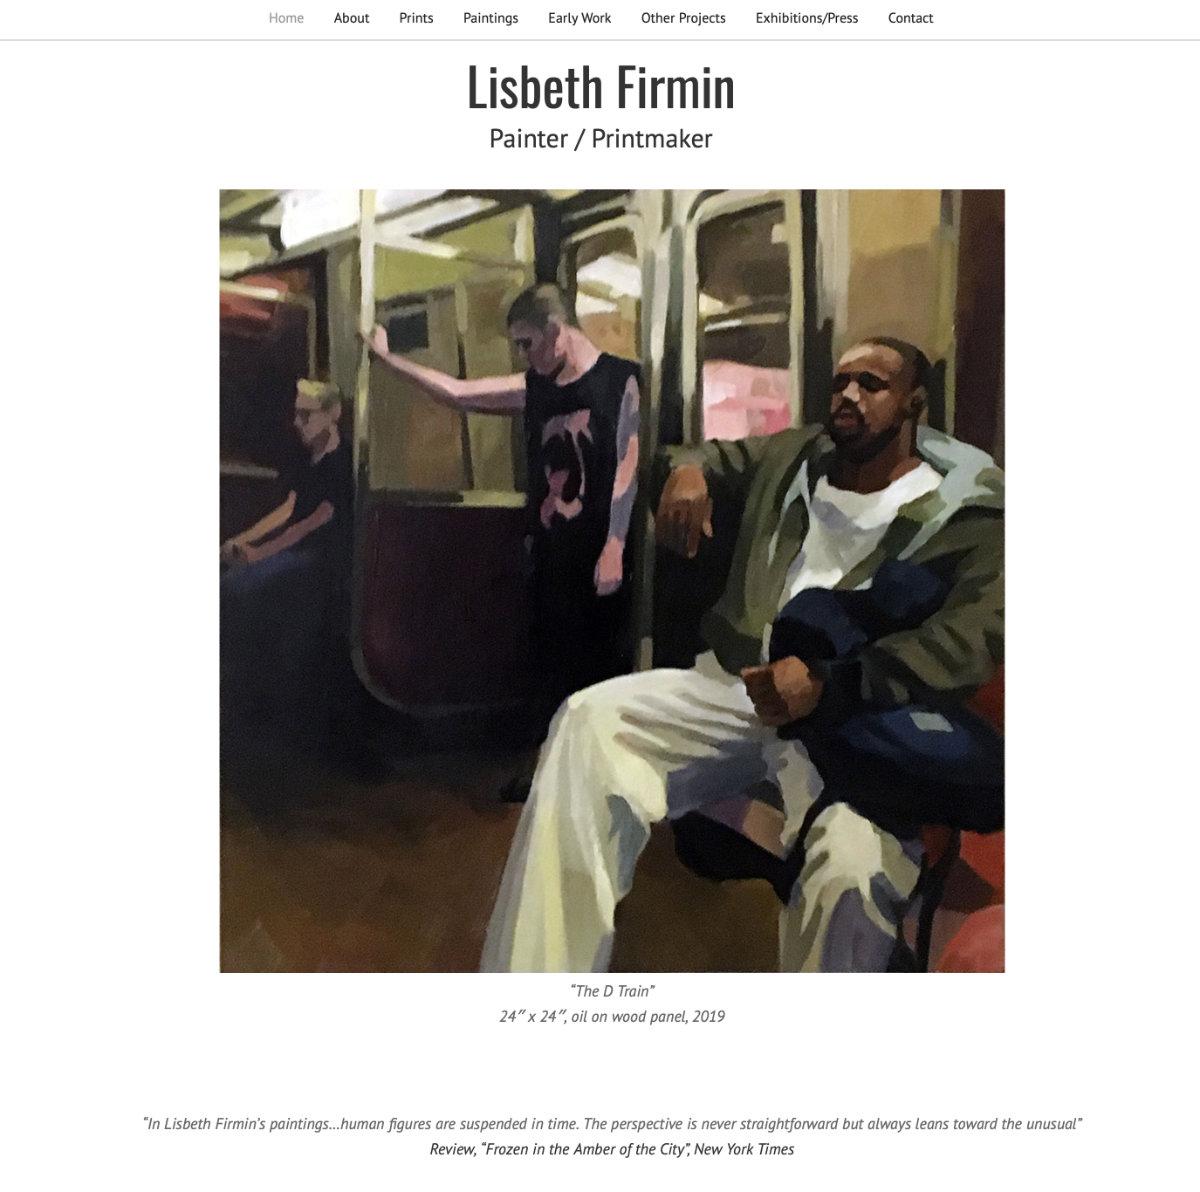 Artist website for Lisbeth Firmin.  Visit website lisbethfirmin.com